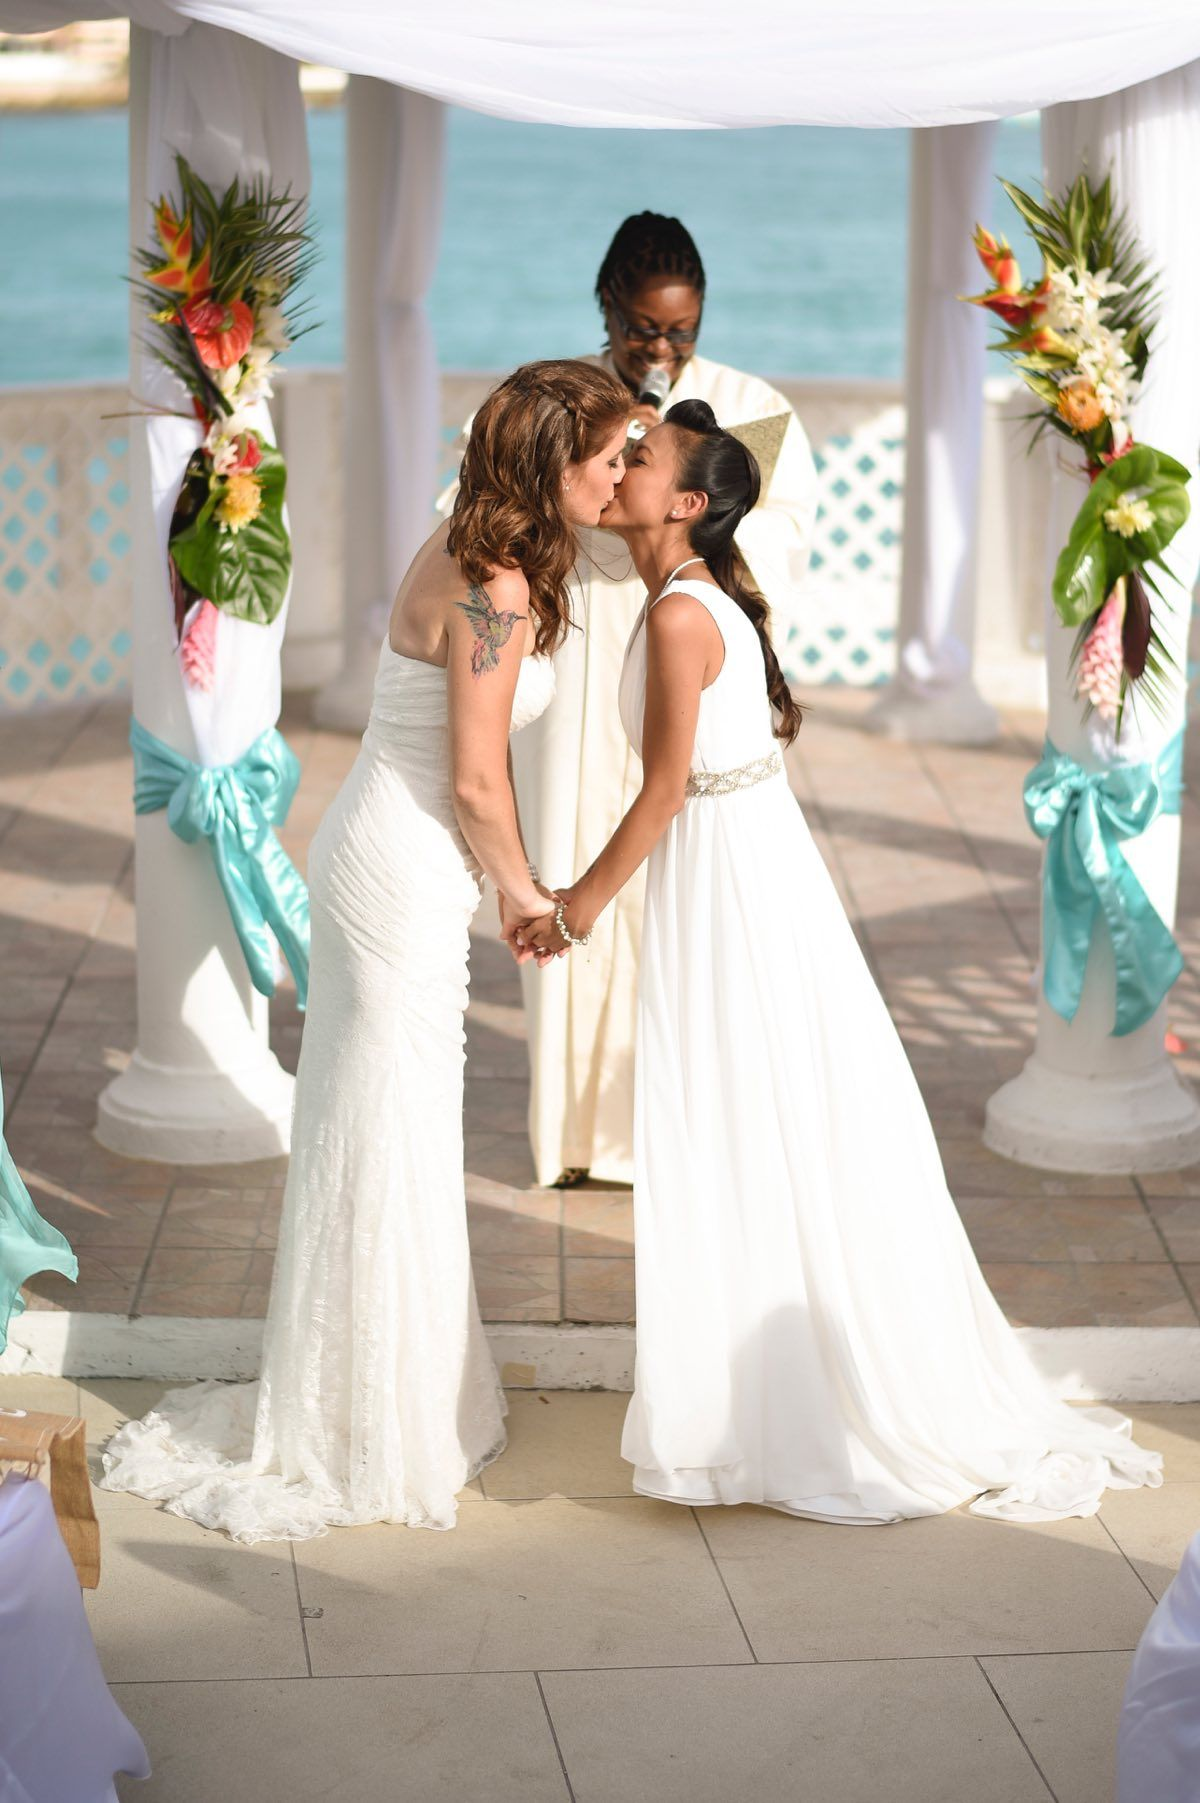 Destination Wedding At The Sonest Maho Beach Resort Sint Maarten Steph Kim